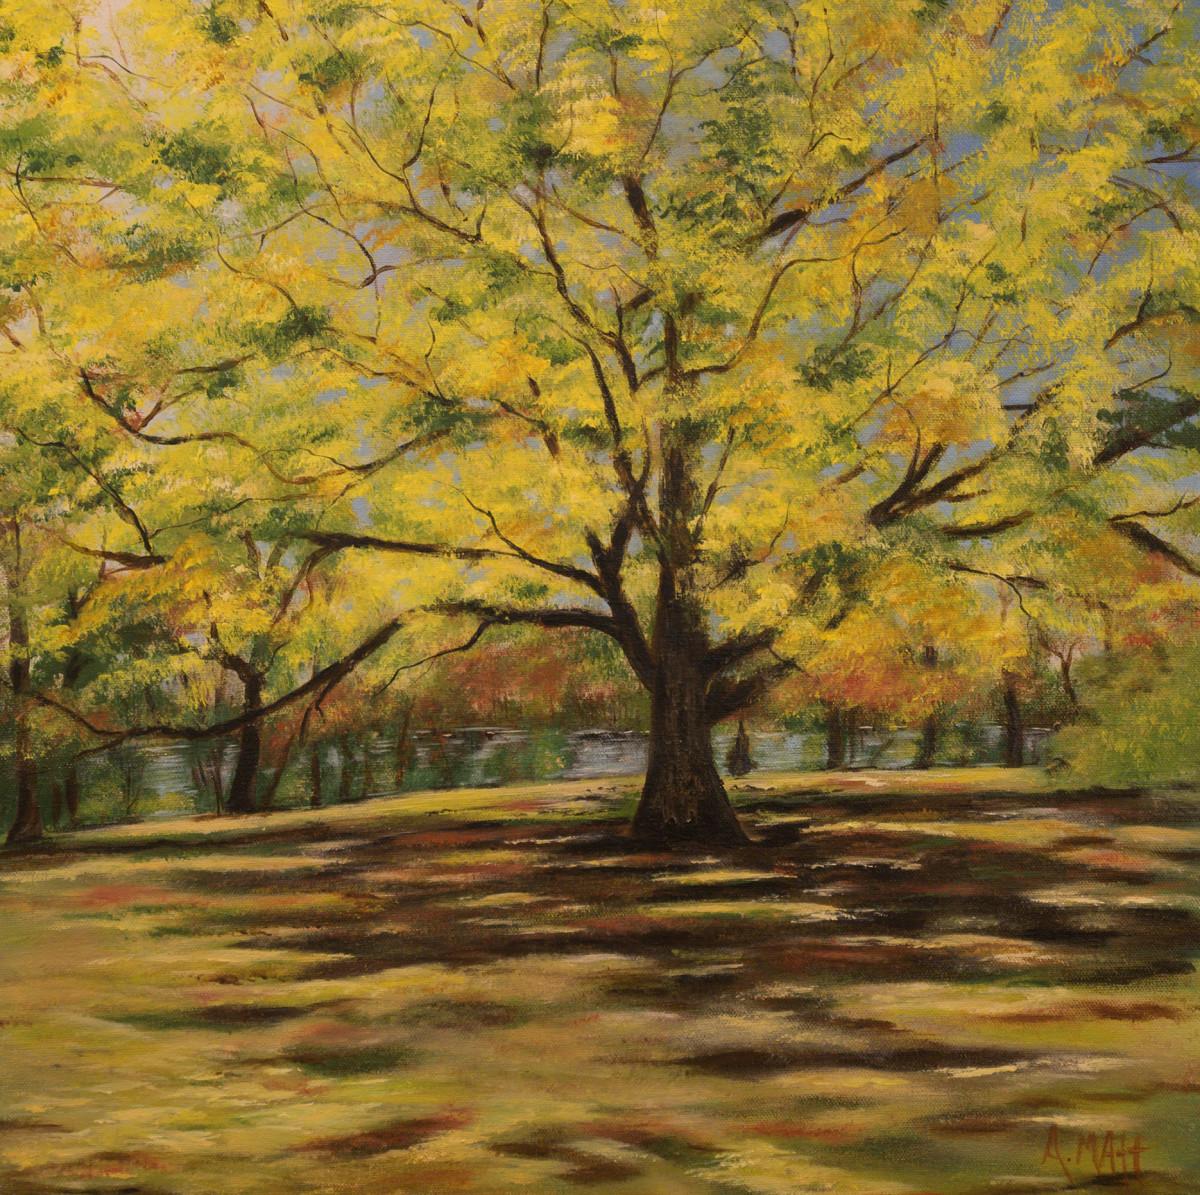 Yellow Tree by Anne Matt